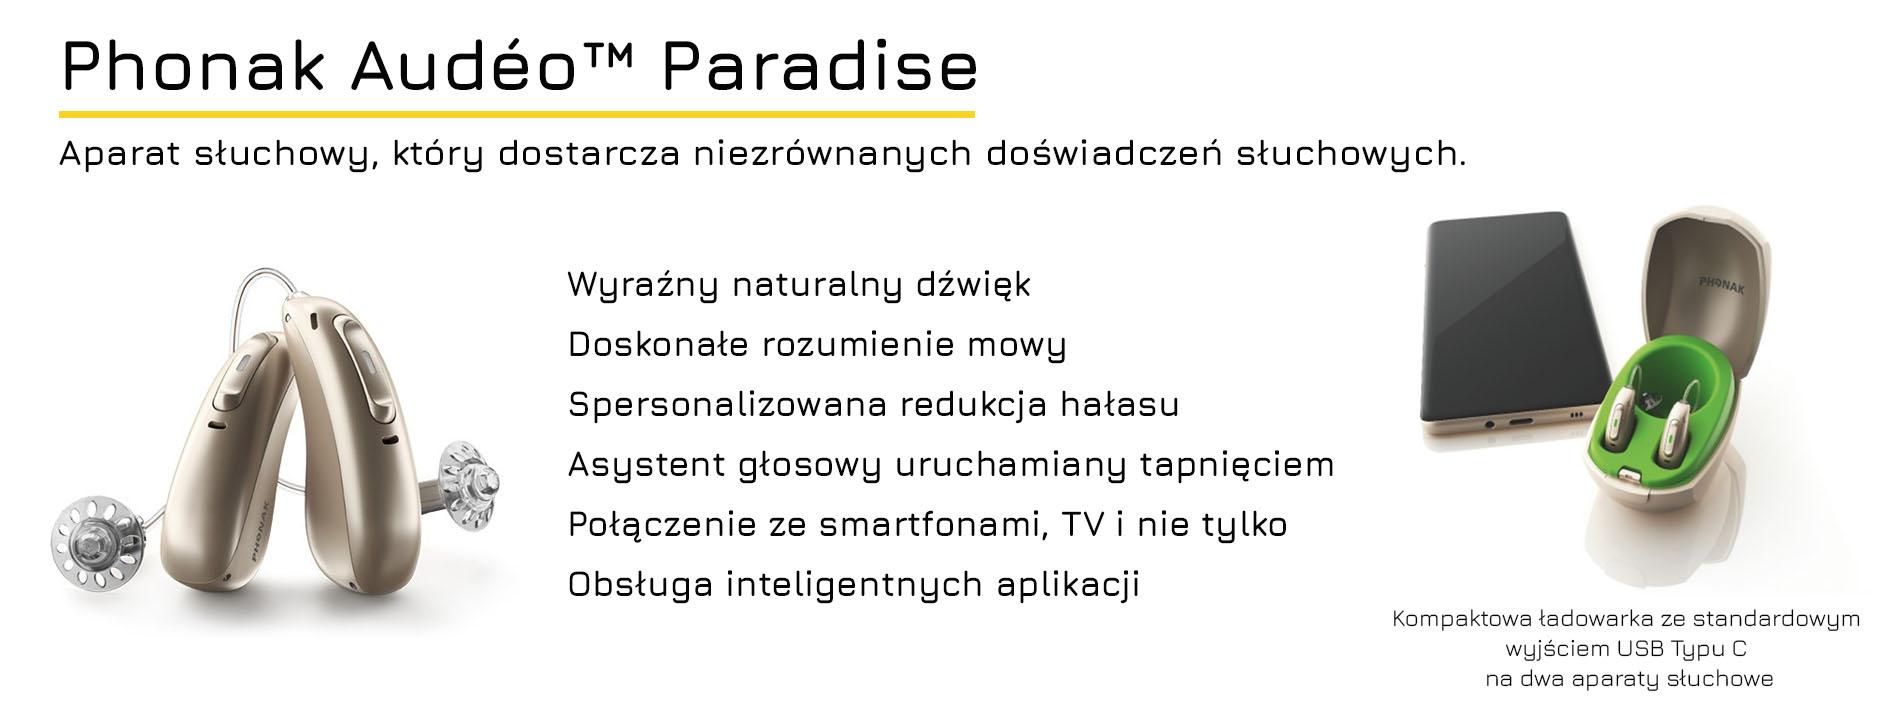 Plakat 03 Aparat słuchowy Phonak Audeo Paradise